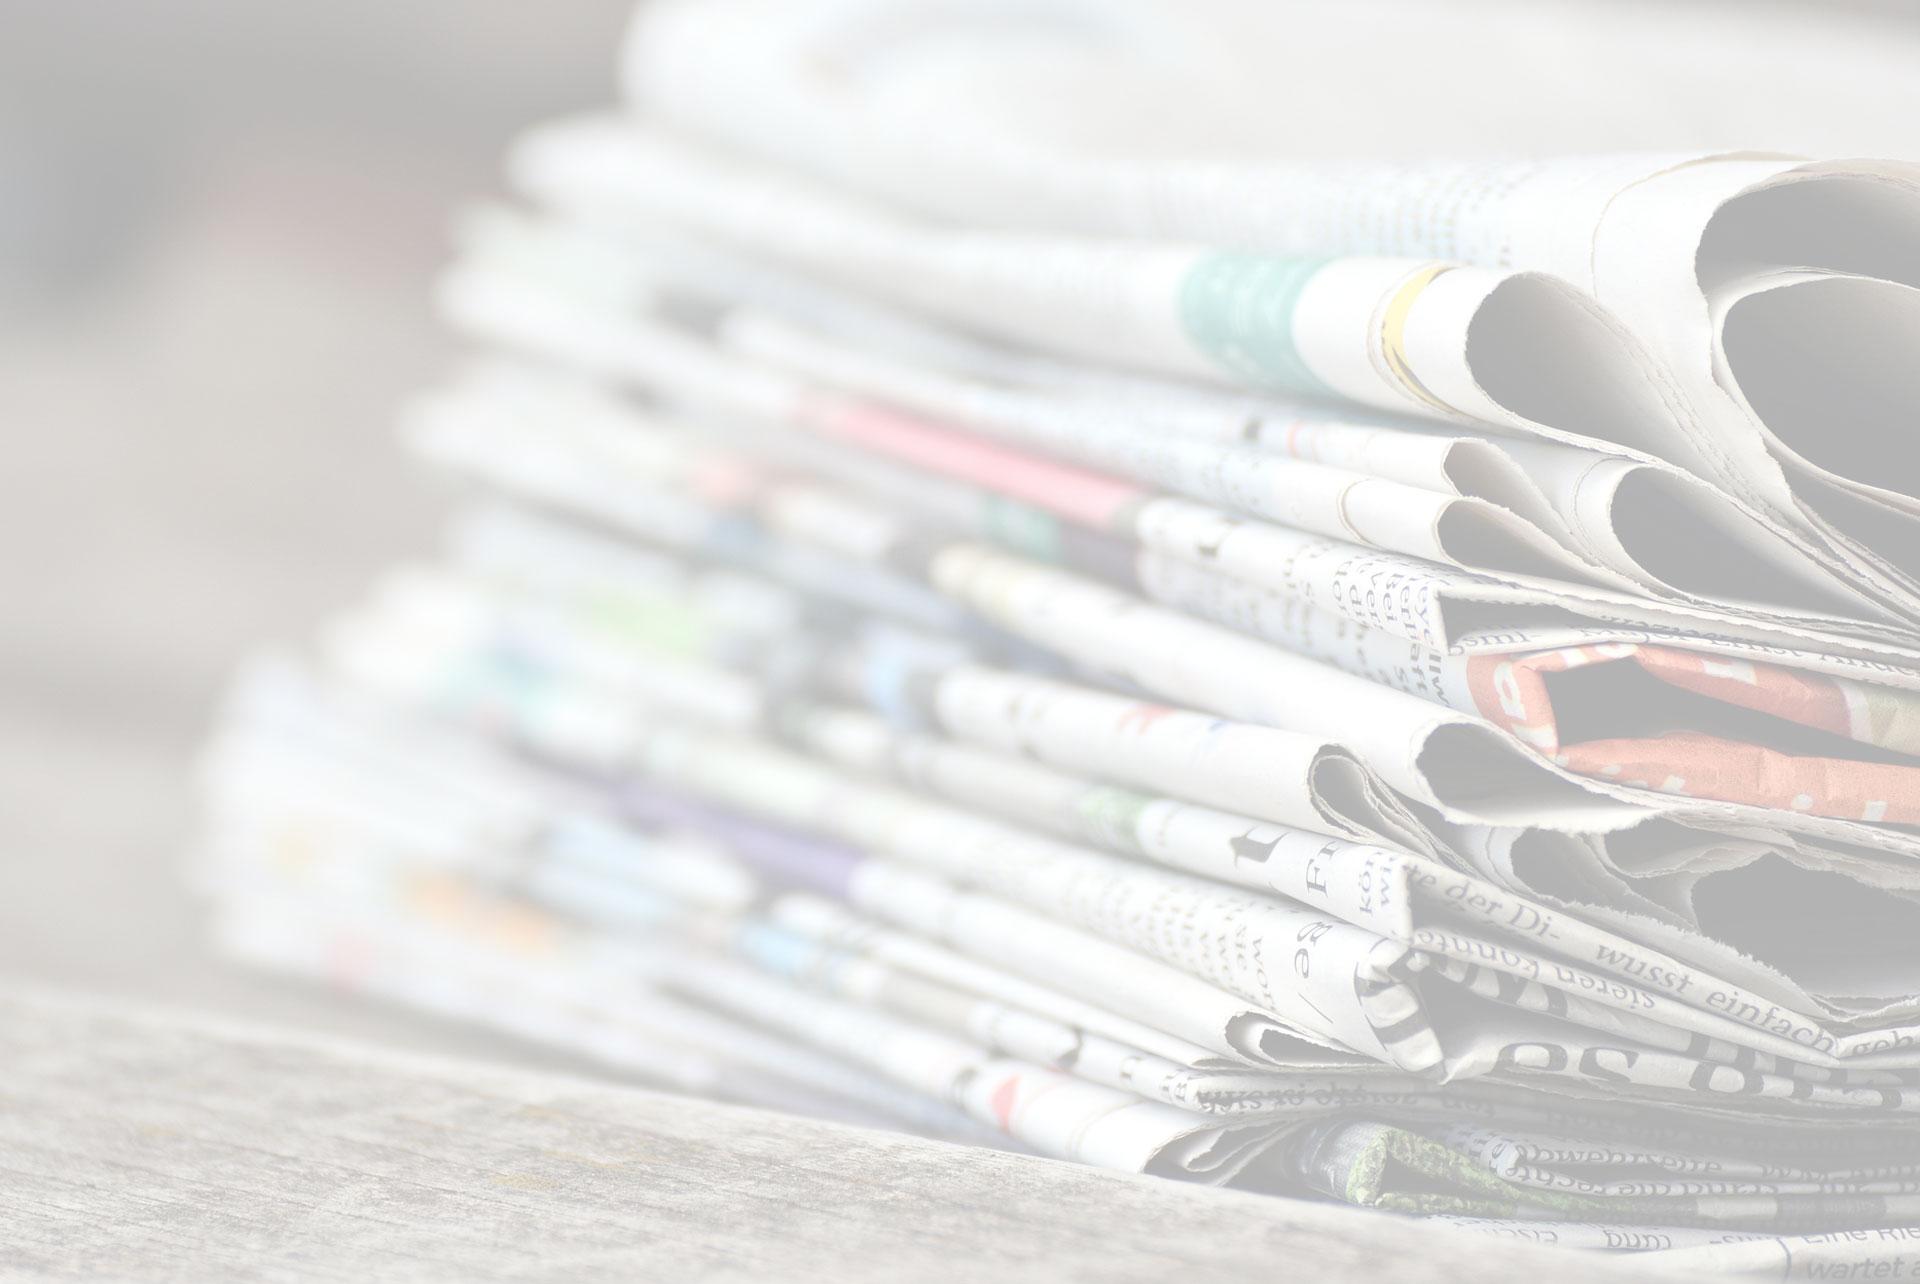 Matteo Salvini Nutella